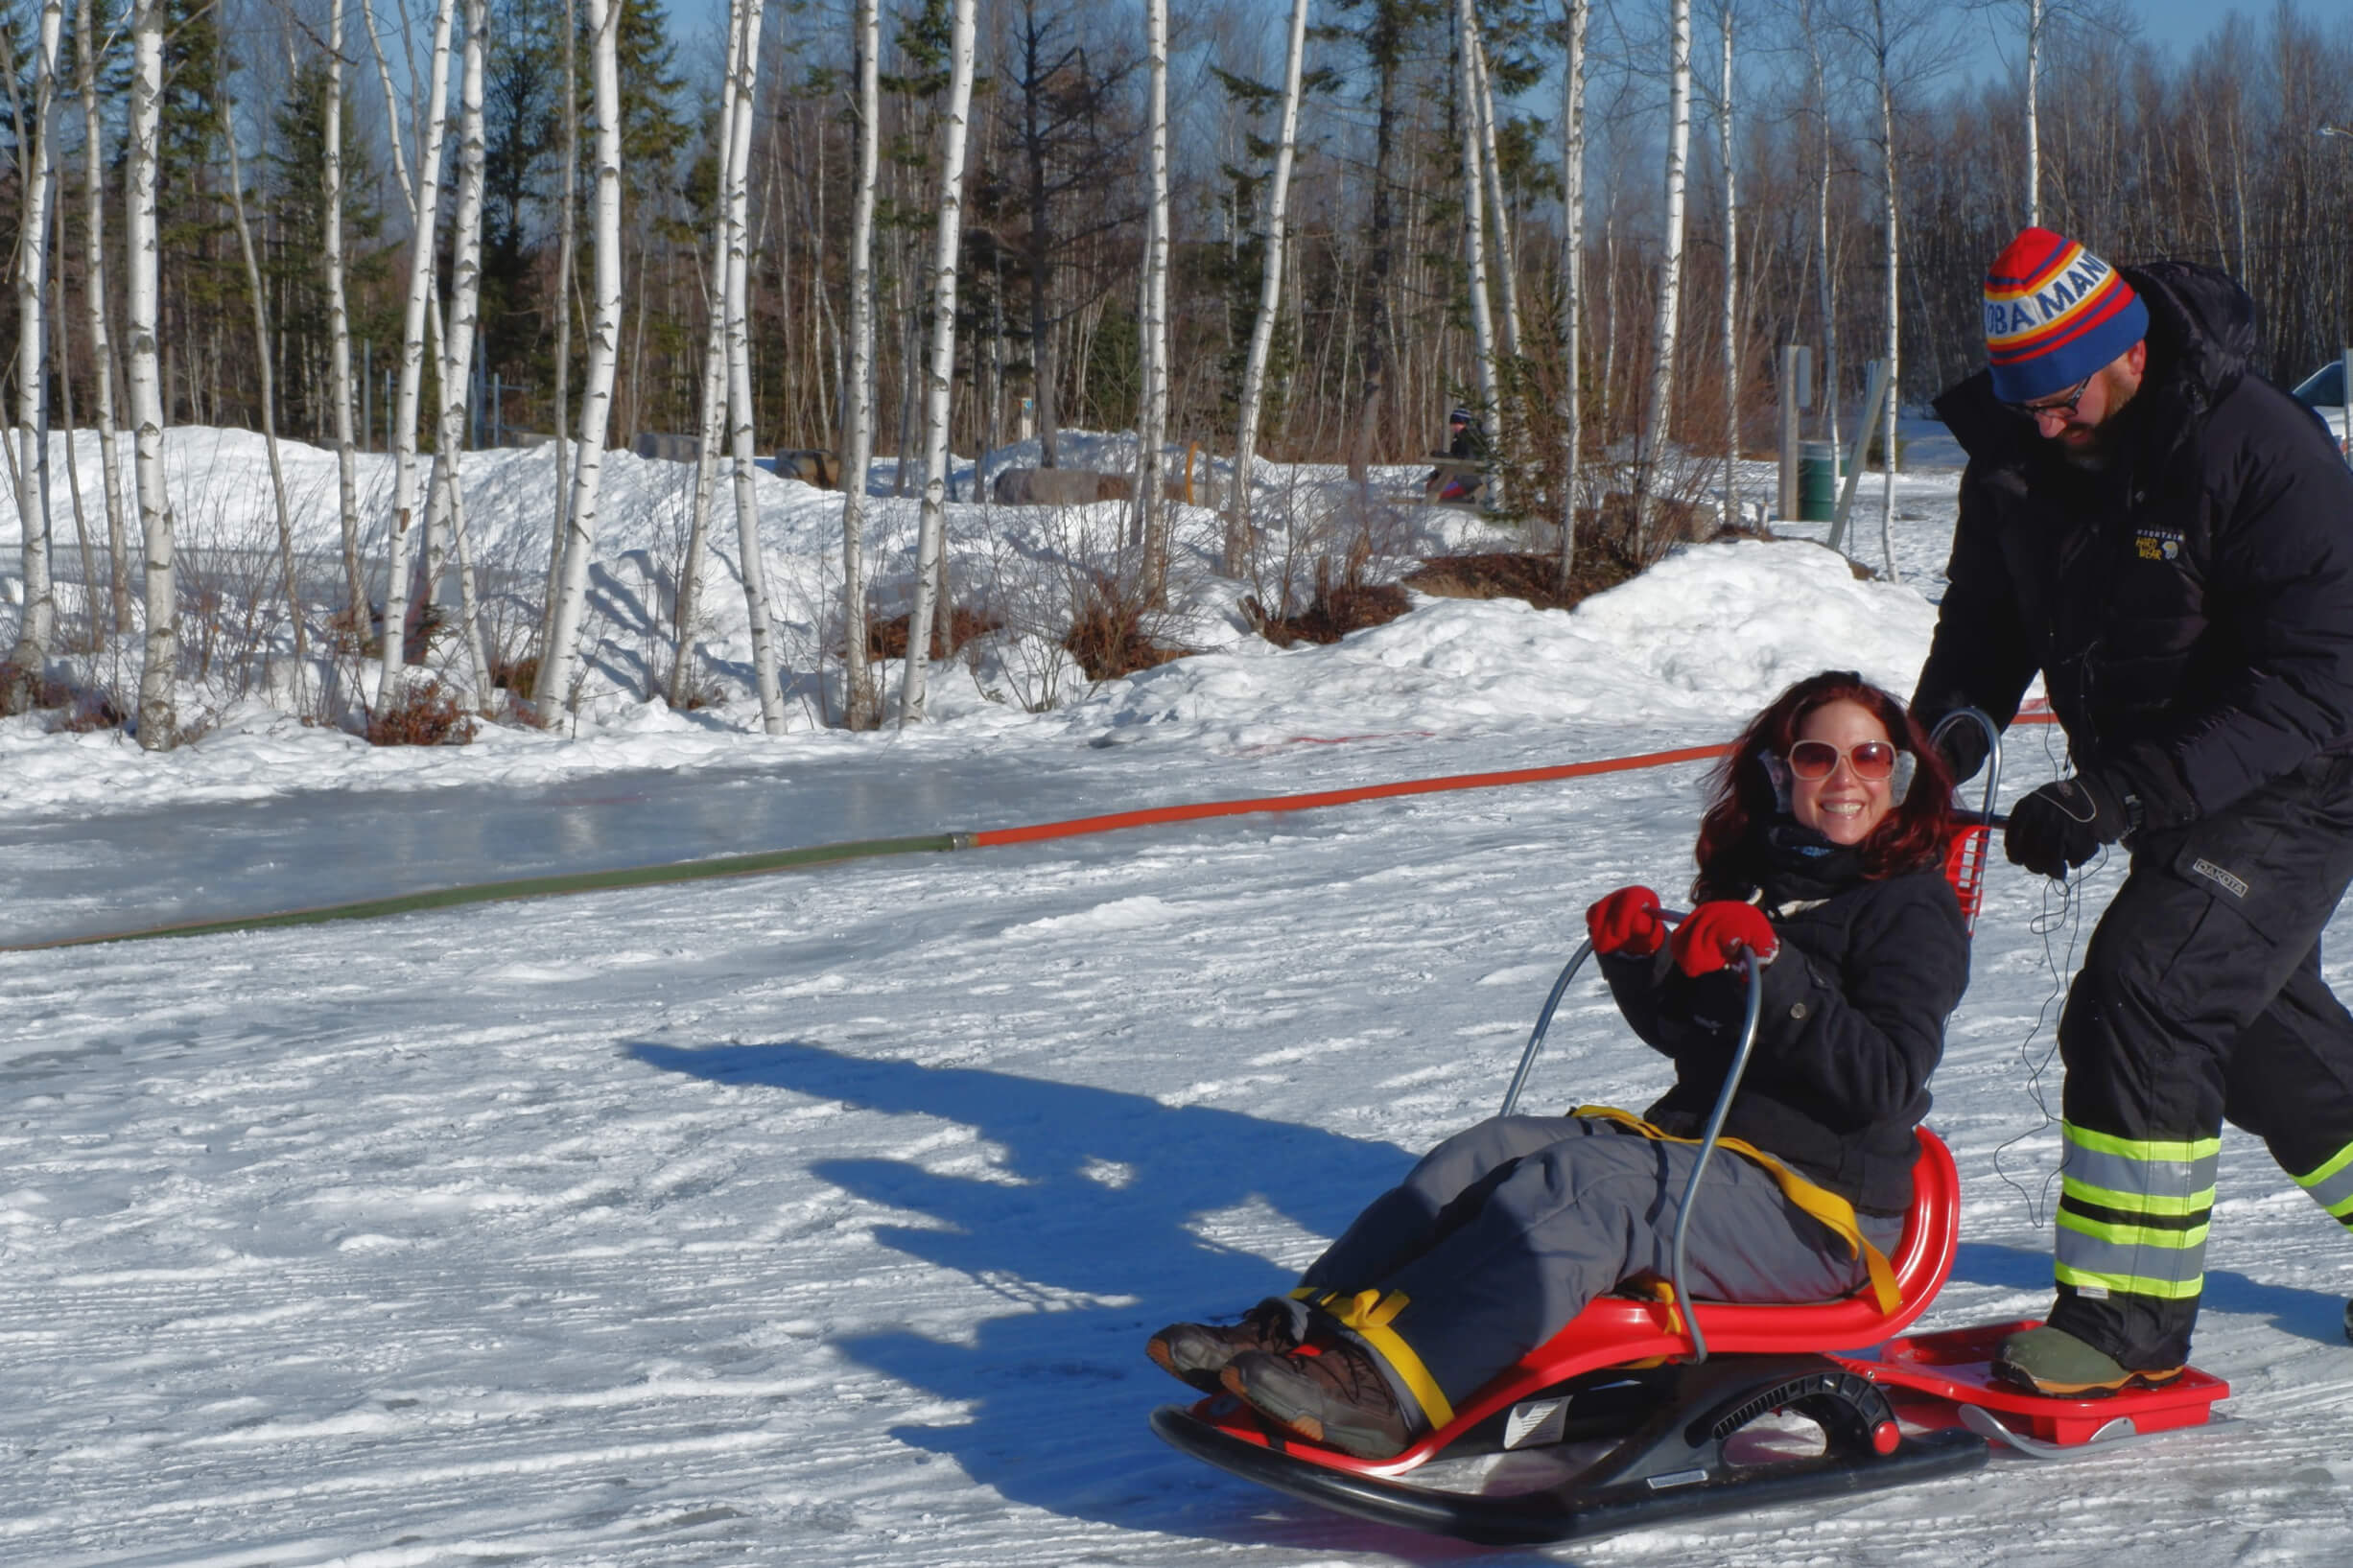 winter wonderland park riverview snowcoach para sport nb new brunswick pickle planet moncton(1)